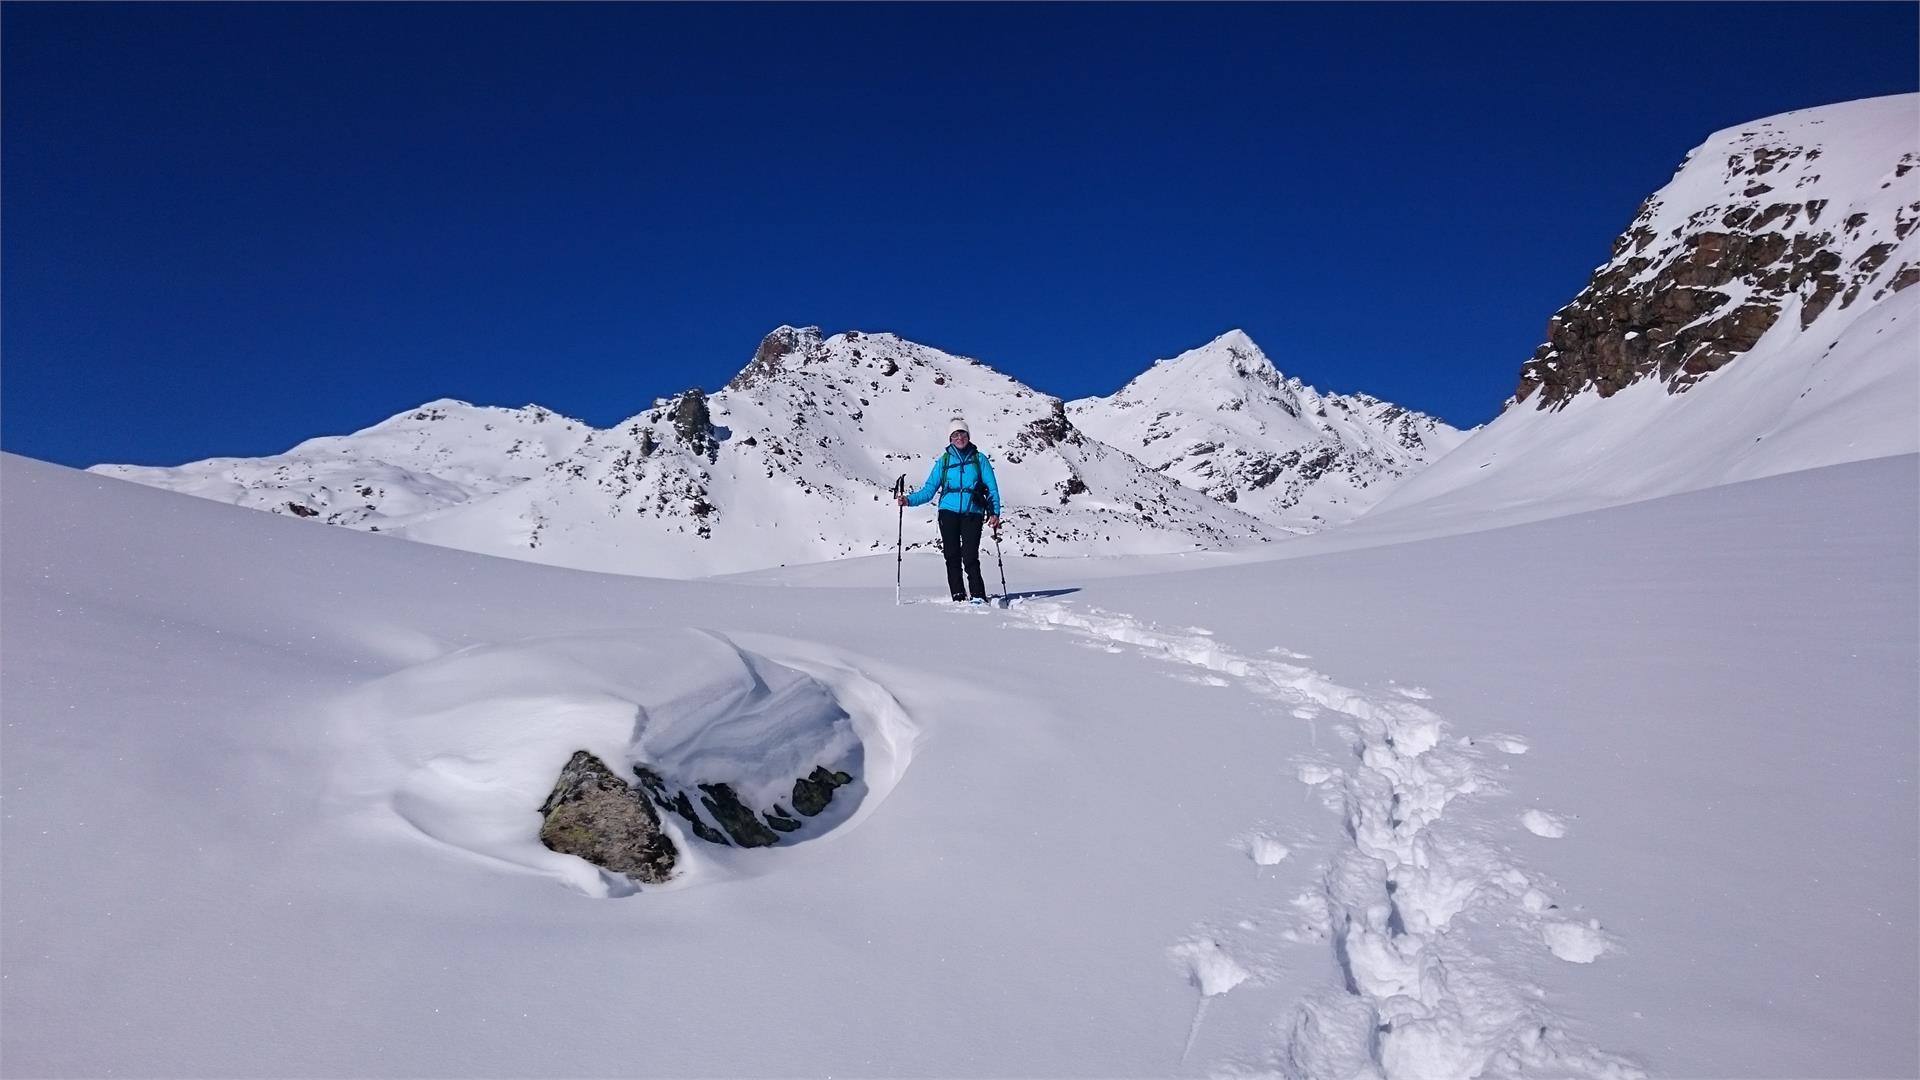 Inverno in Vallelunga